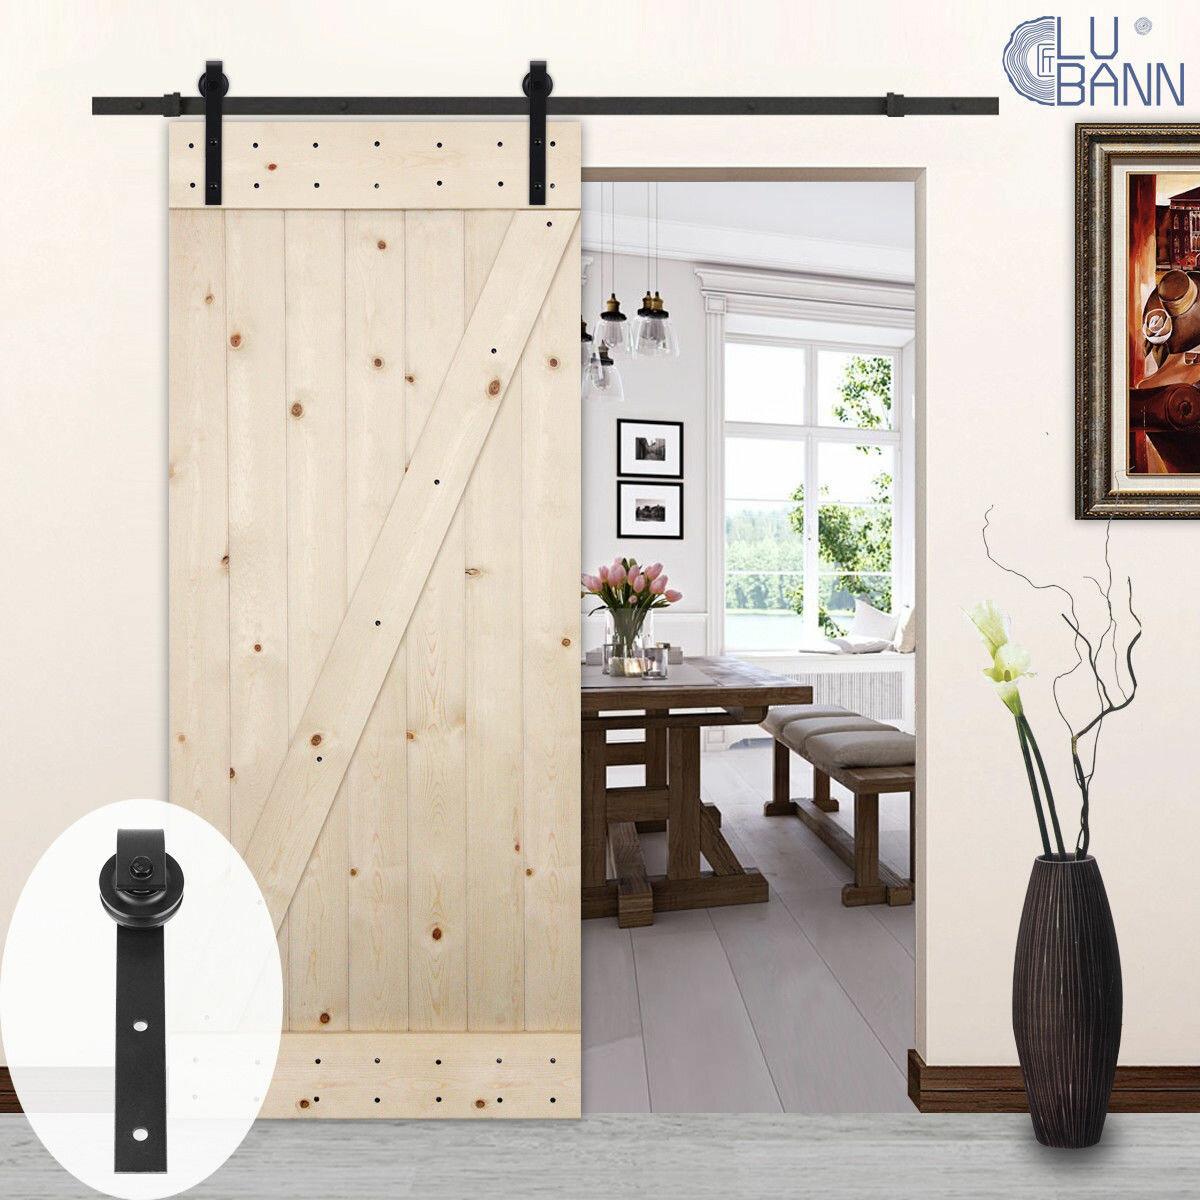 Lubann Clic J Style Sliding Wood Track Kit Barn Door Hardware Reviews Wayfair